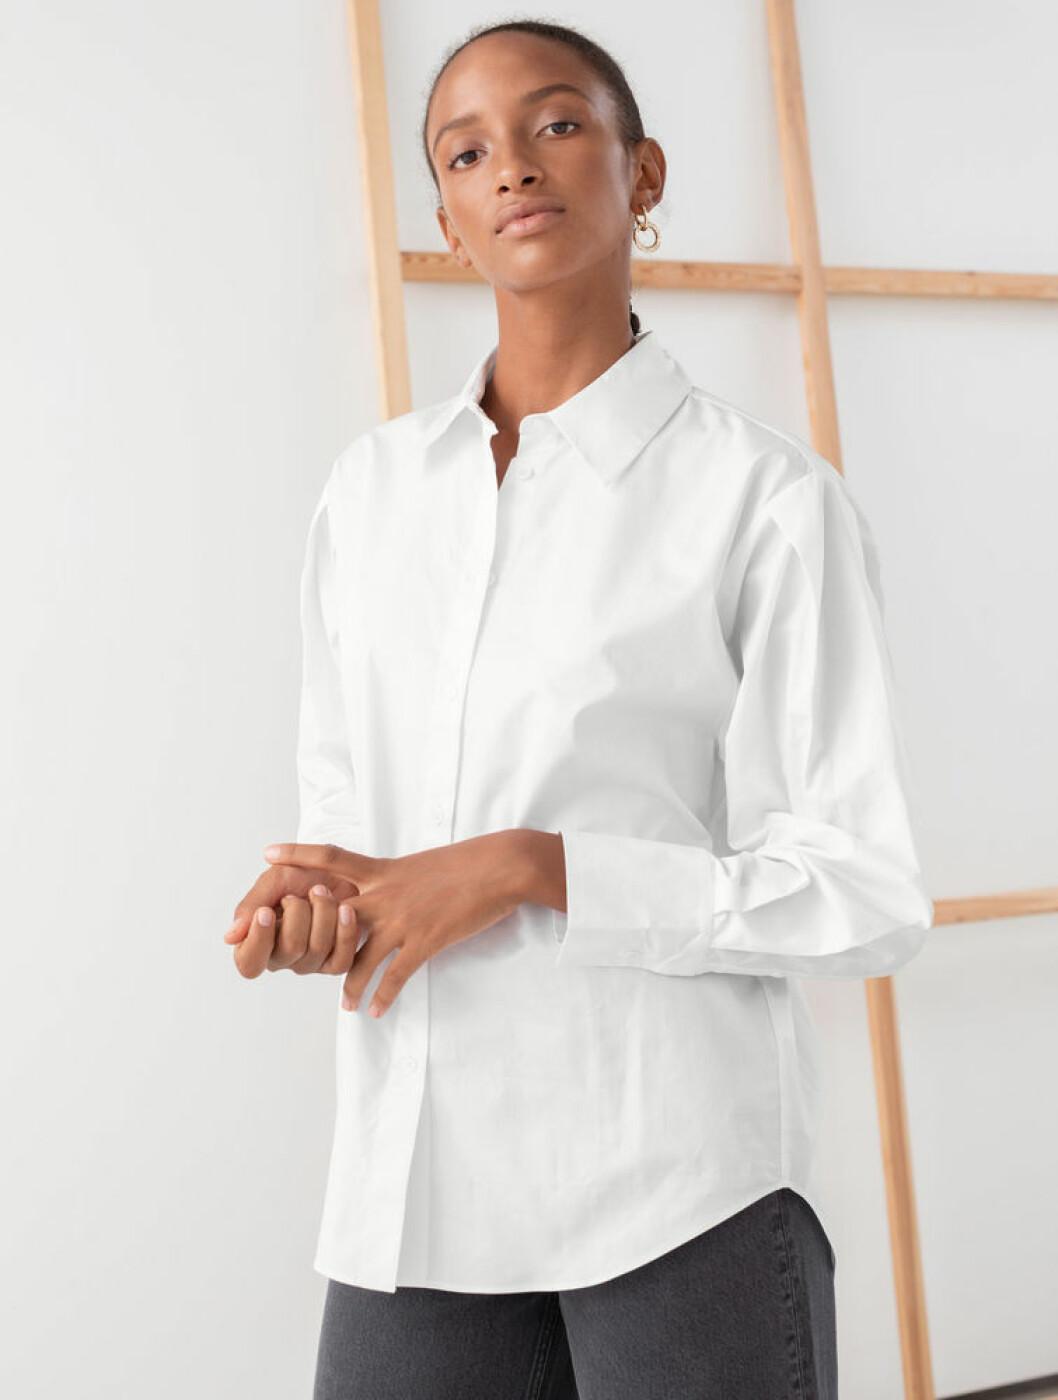 Vit skjorta från & other stories